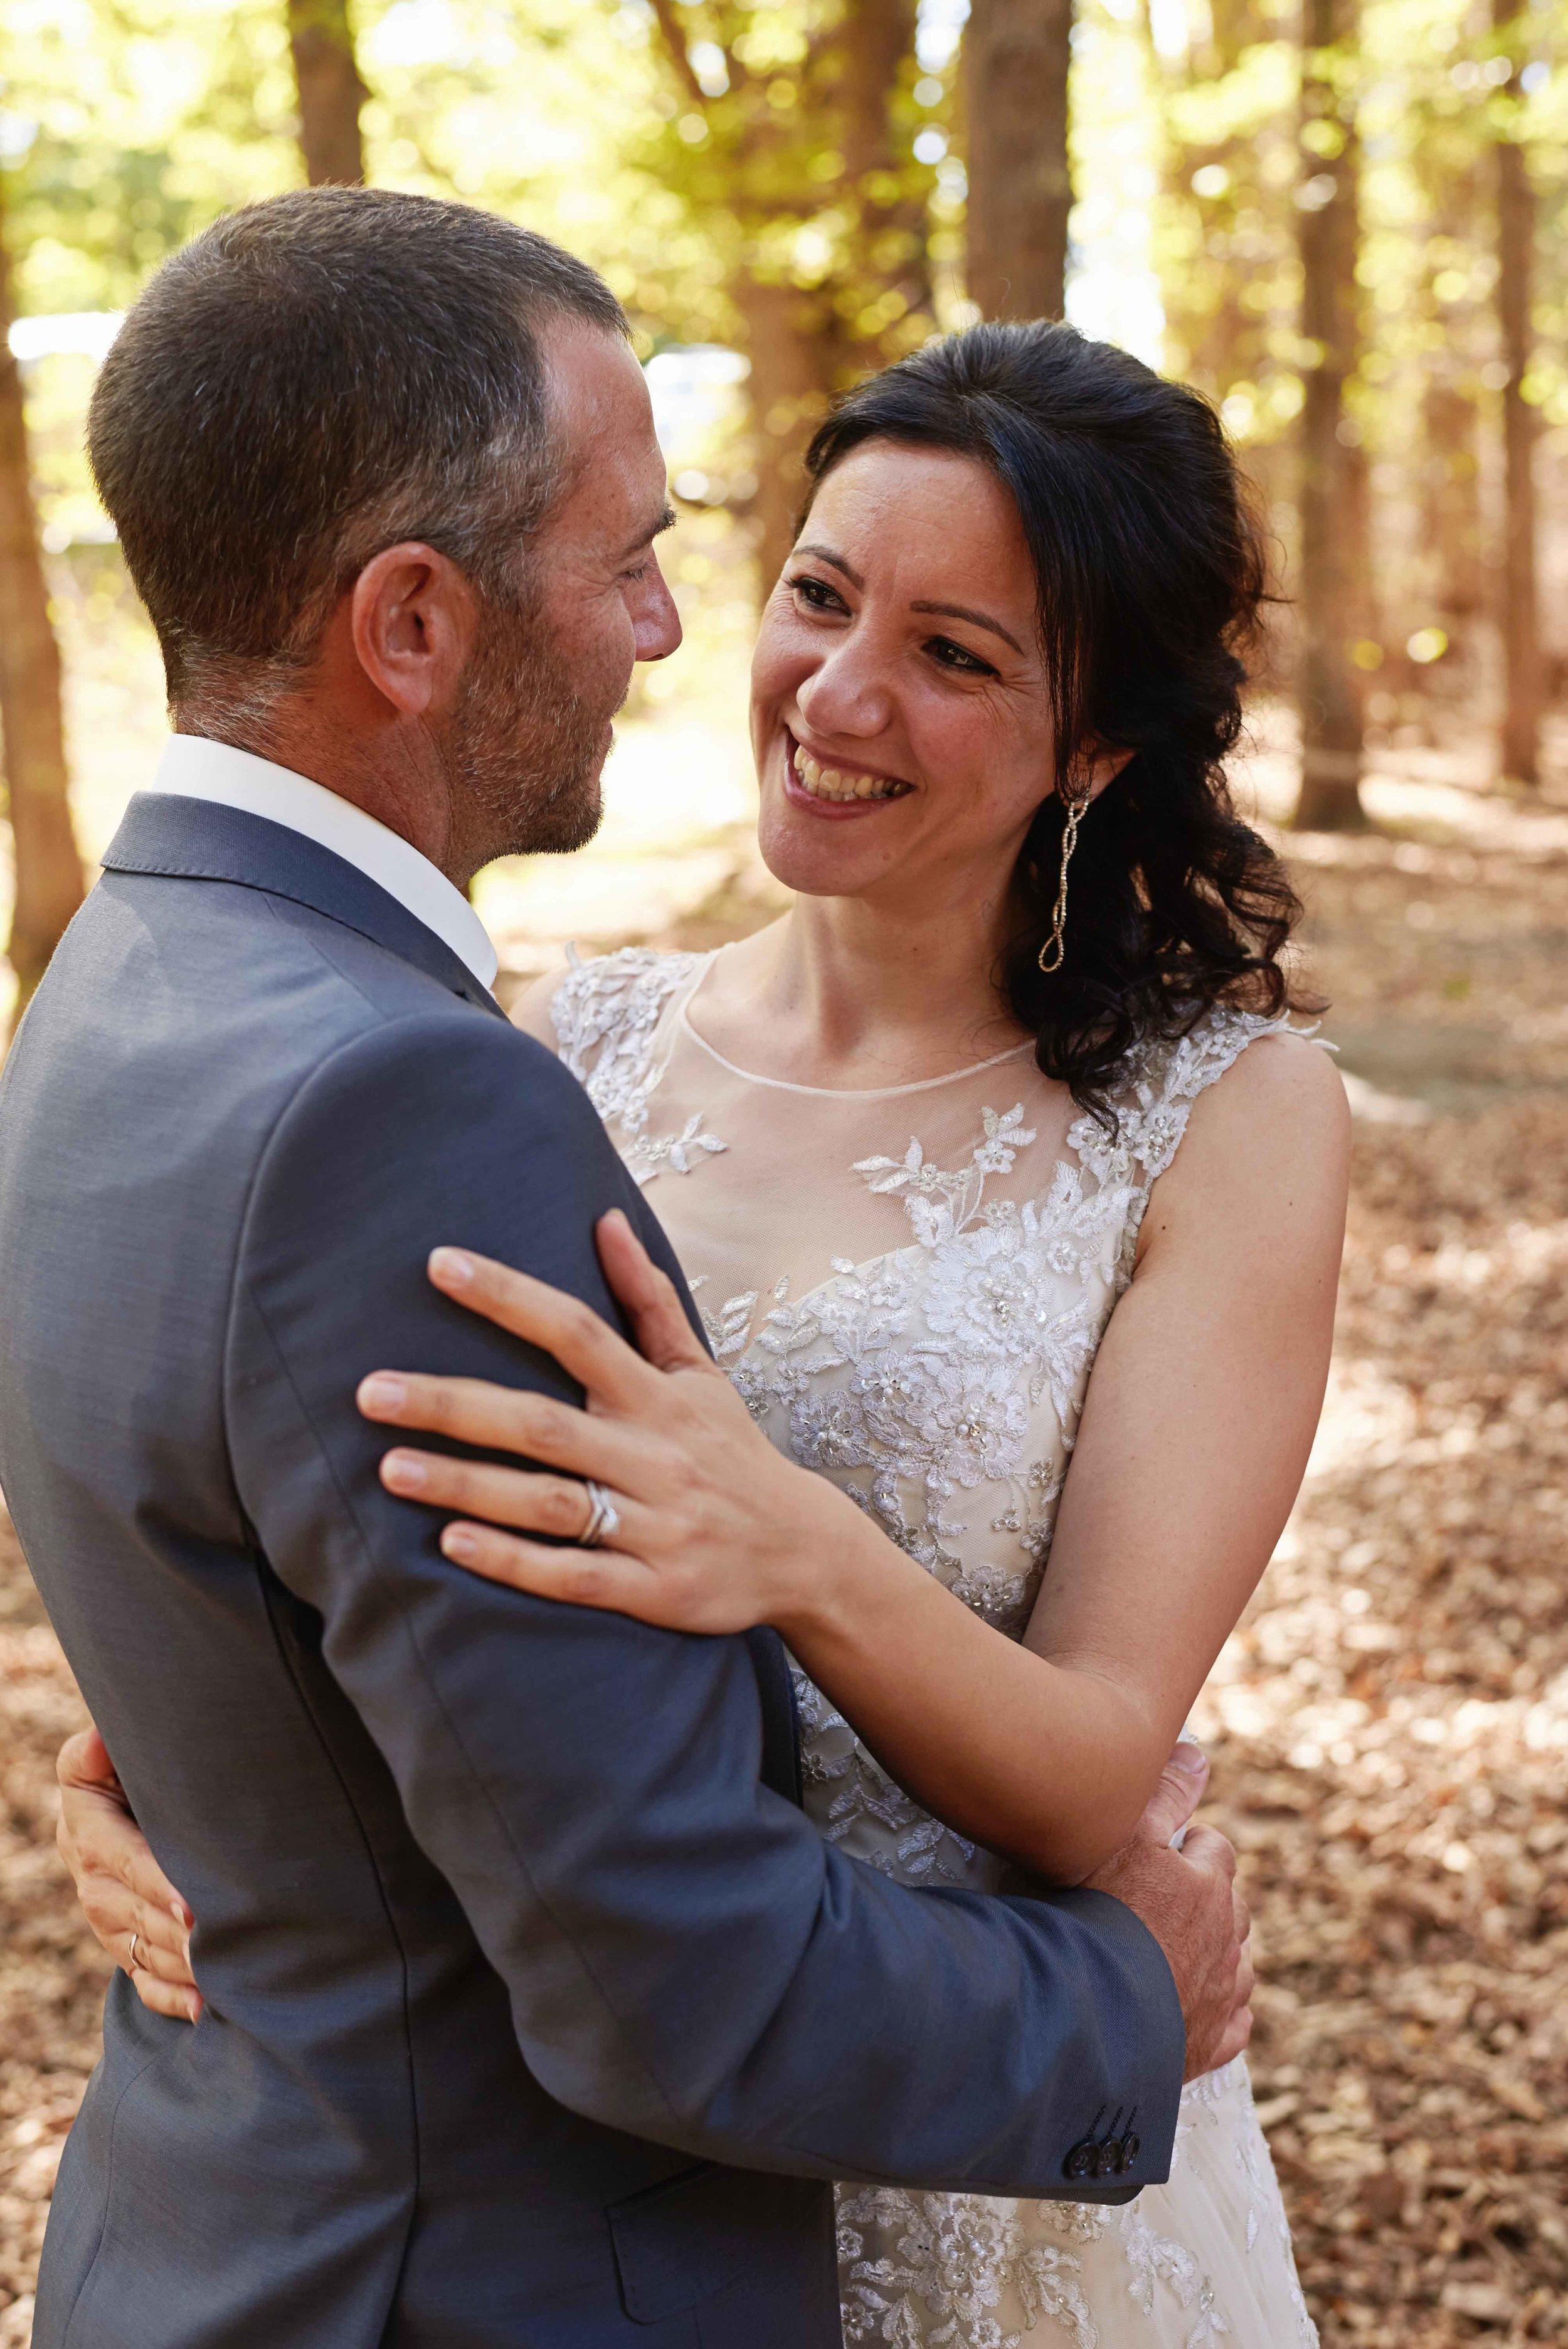 sorrento-wedding-photography-all-smiles-marissa-jade-photography-147.jpg